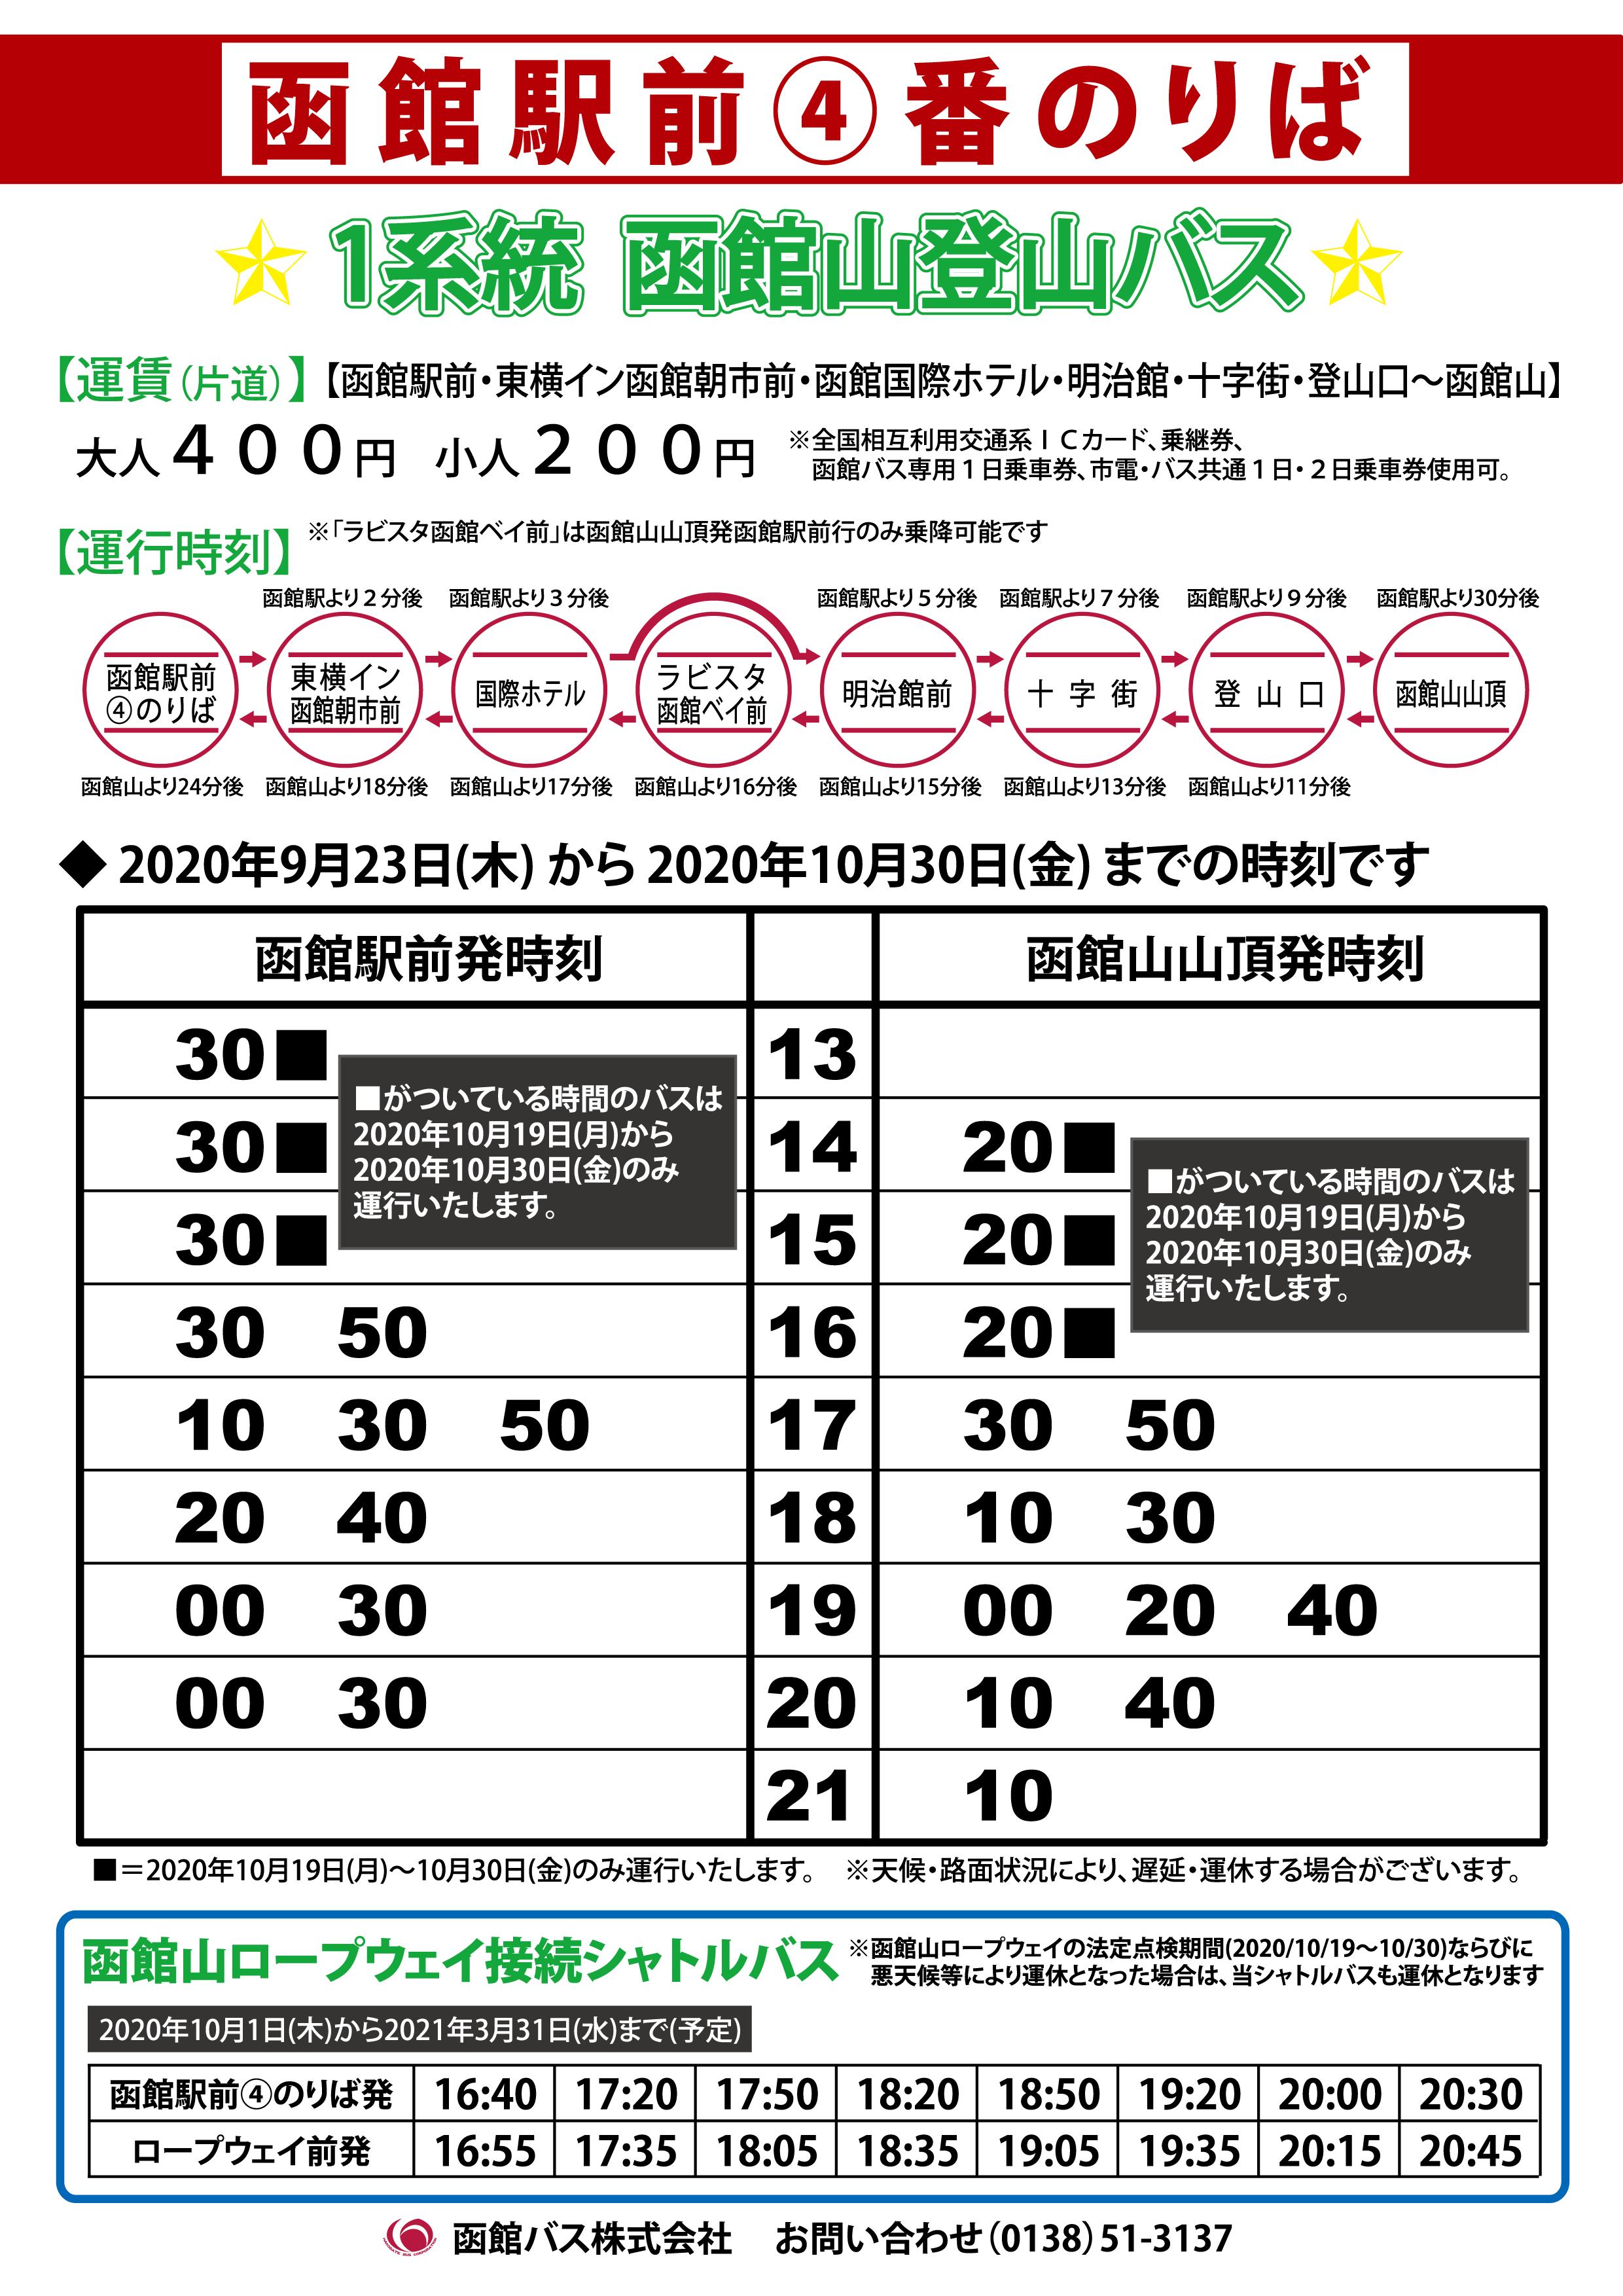 函館バス 時刻表